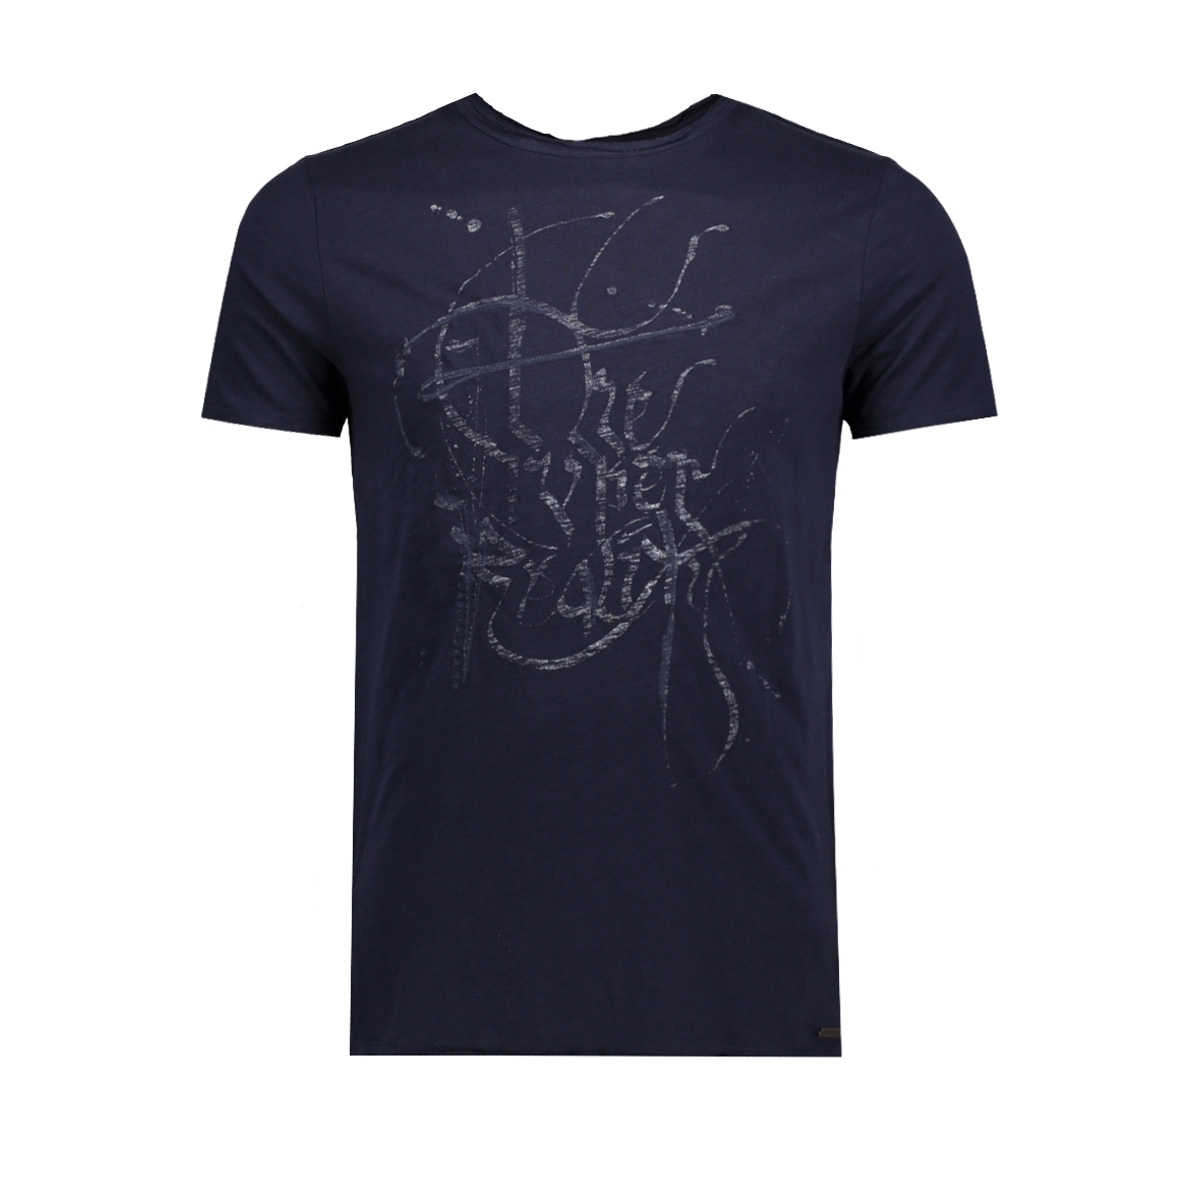 g71004 garcia t-shirt 292